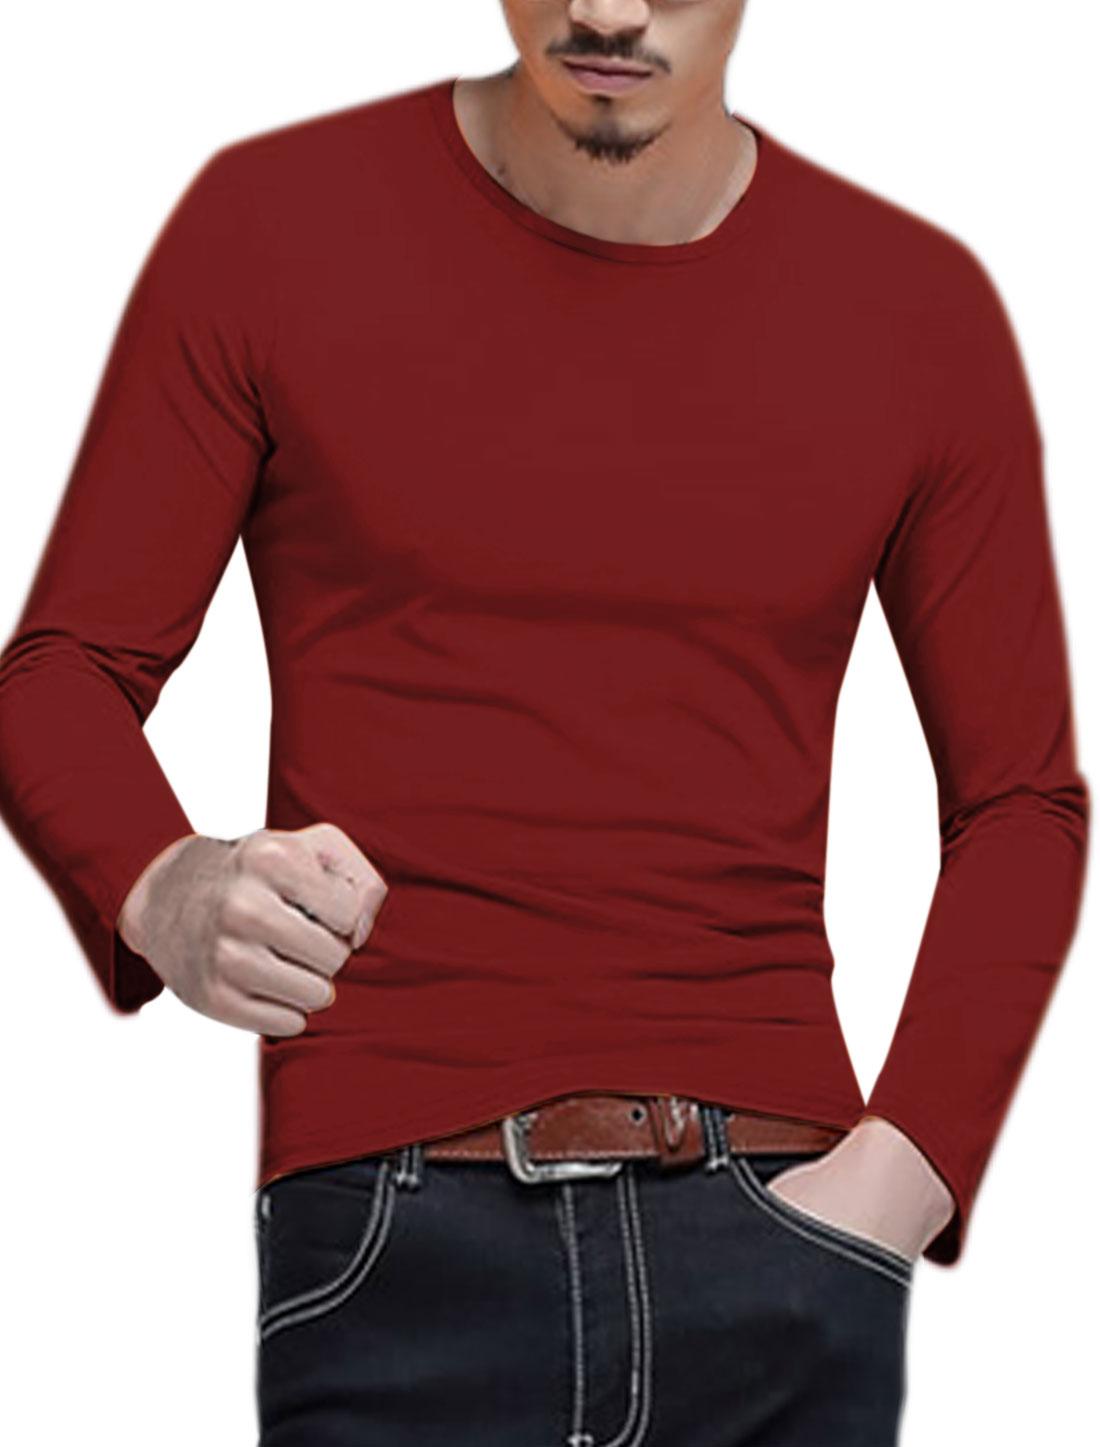 Men Long Sleeves Crew Neck Slim Fit Tee Shirt Red M